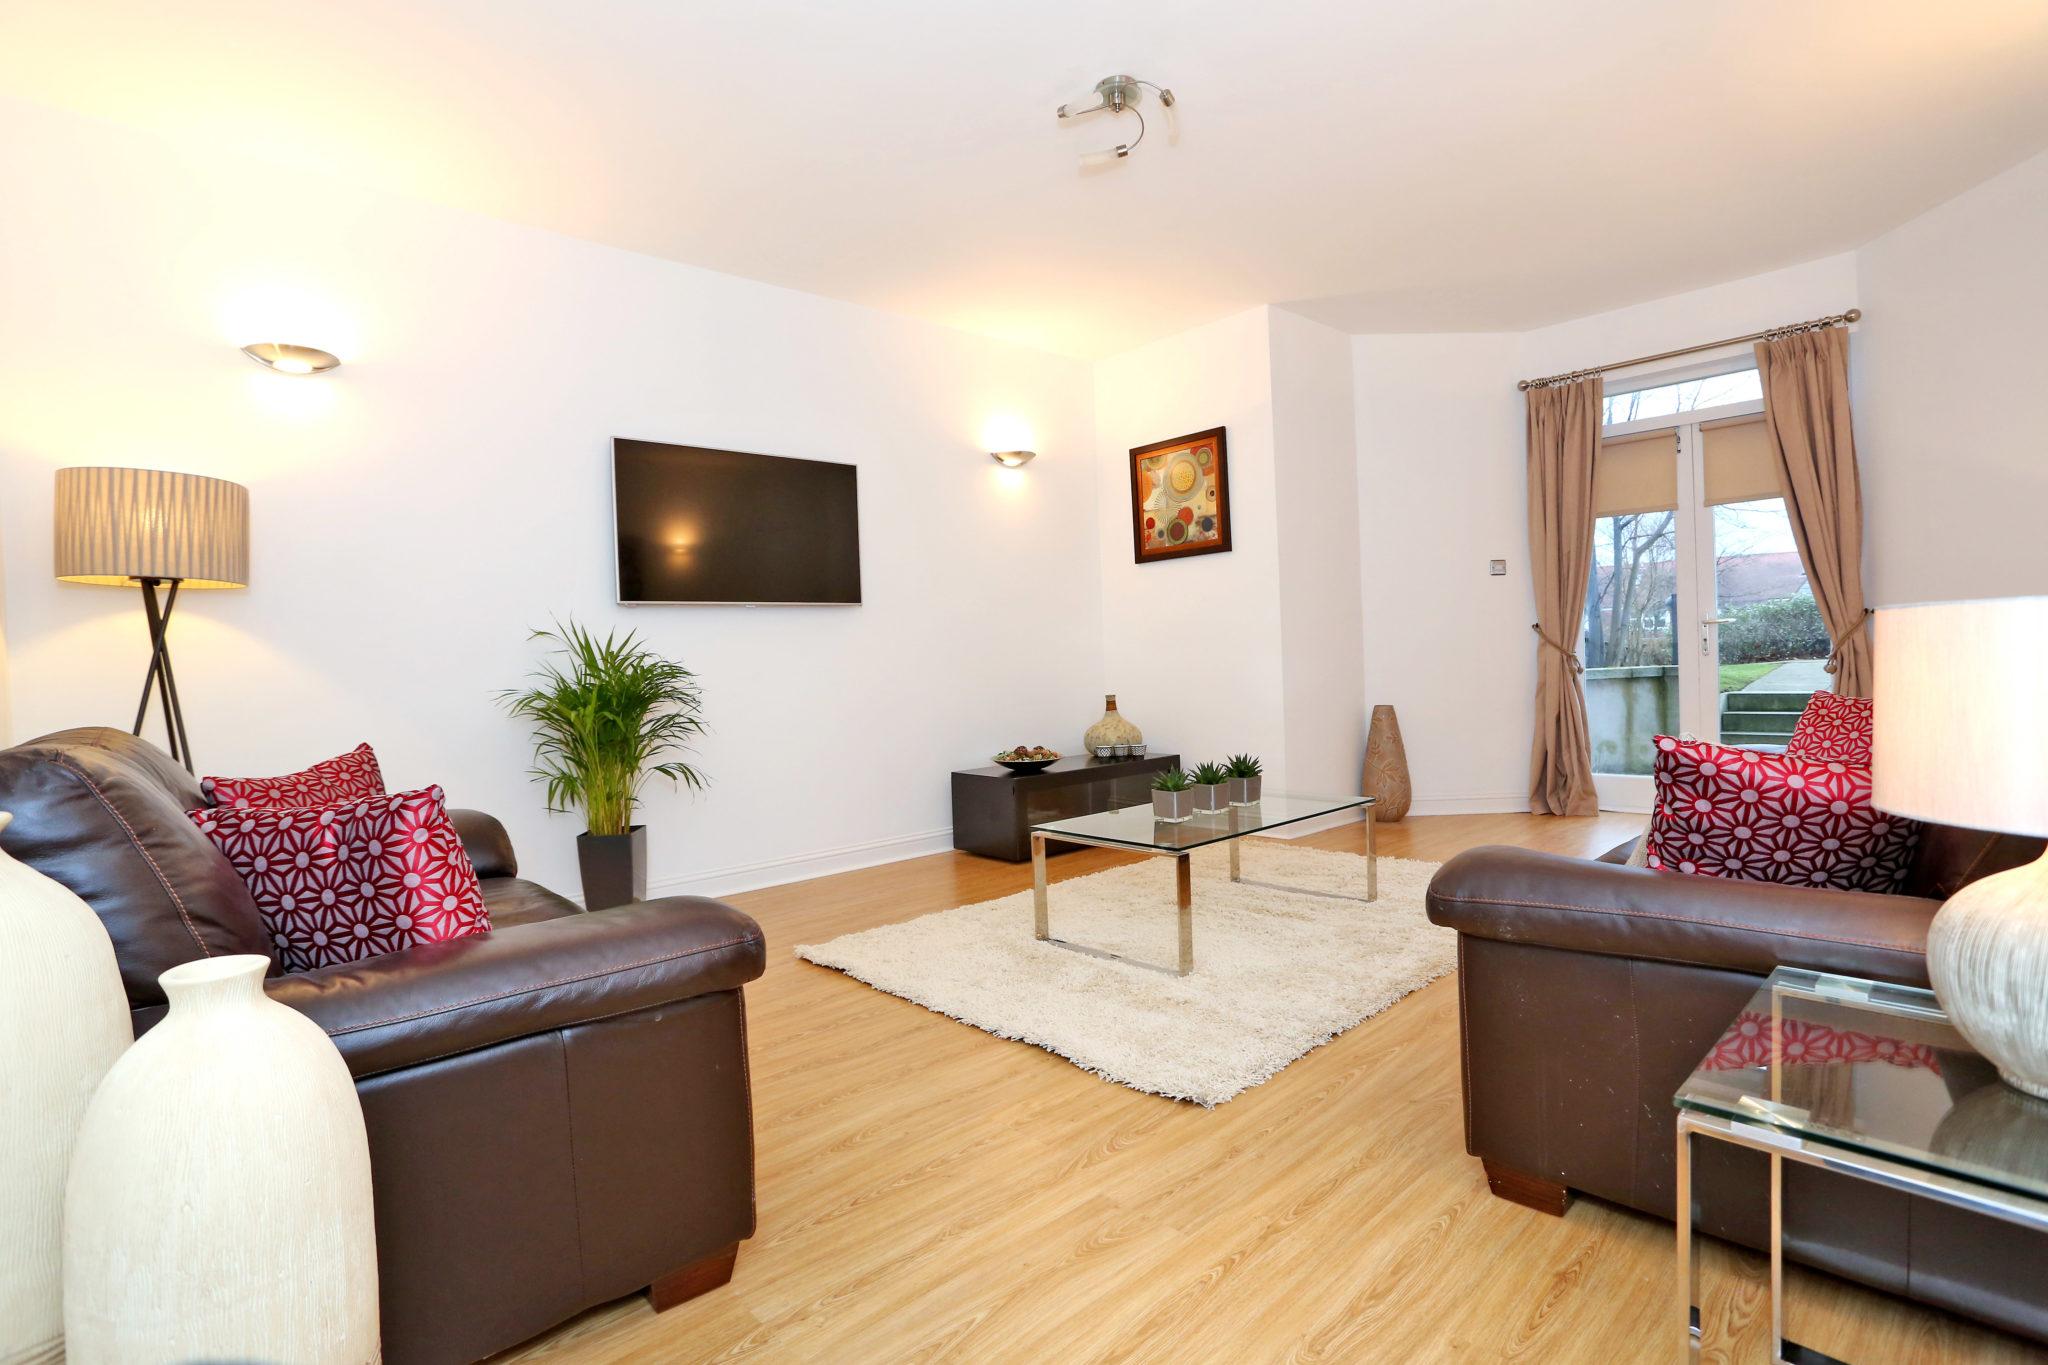 Cheap-Accommodation-Aberdeen---Queen's-Road-Apartments-Near-Hazelhead-Park---Urban-Stay-1